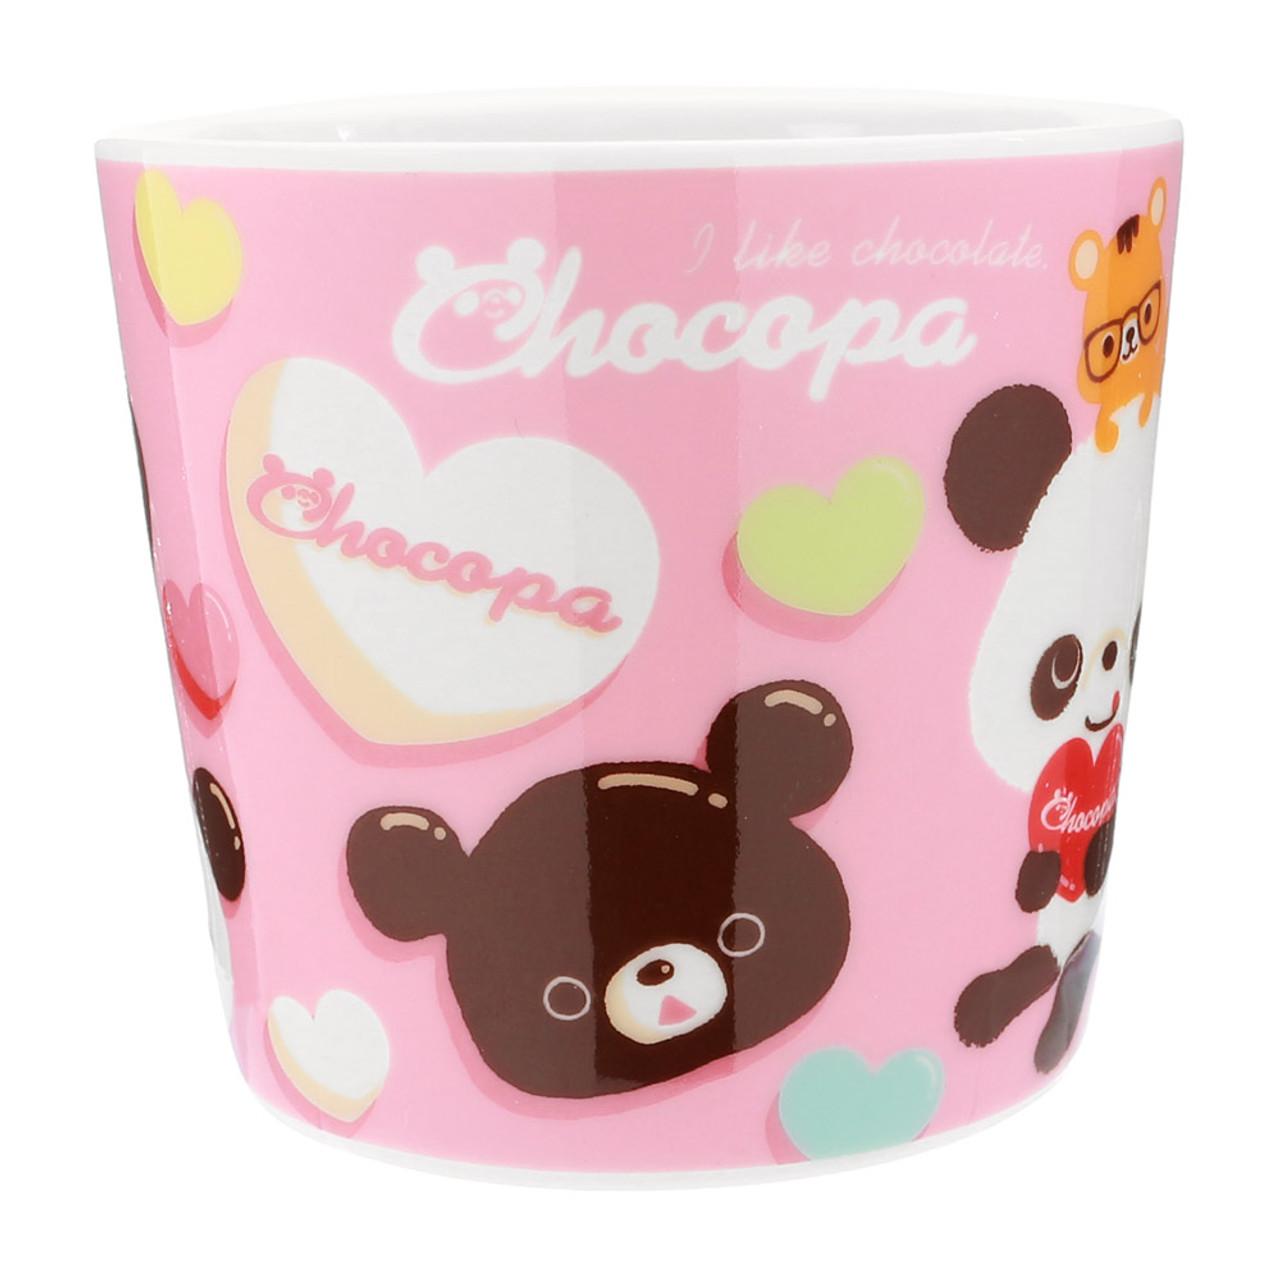 San-x Chocopa Panda Pink Porcelain Mug ( Side View )